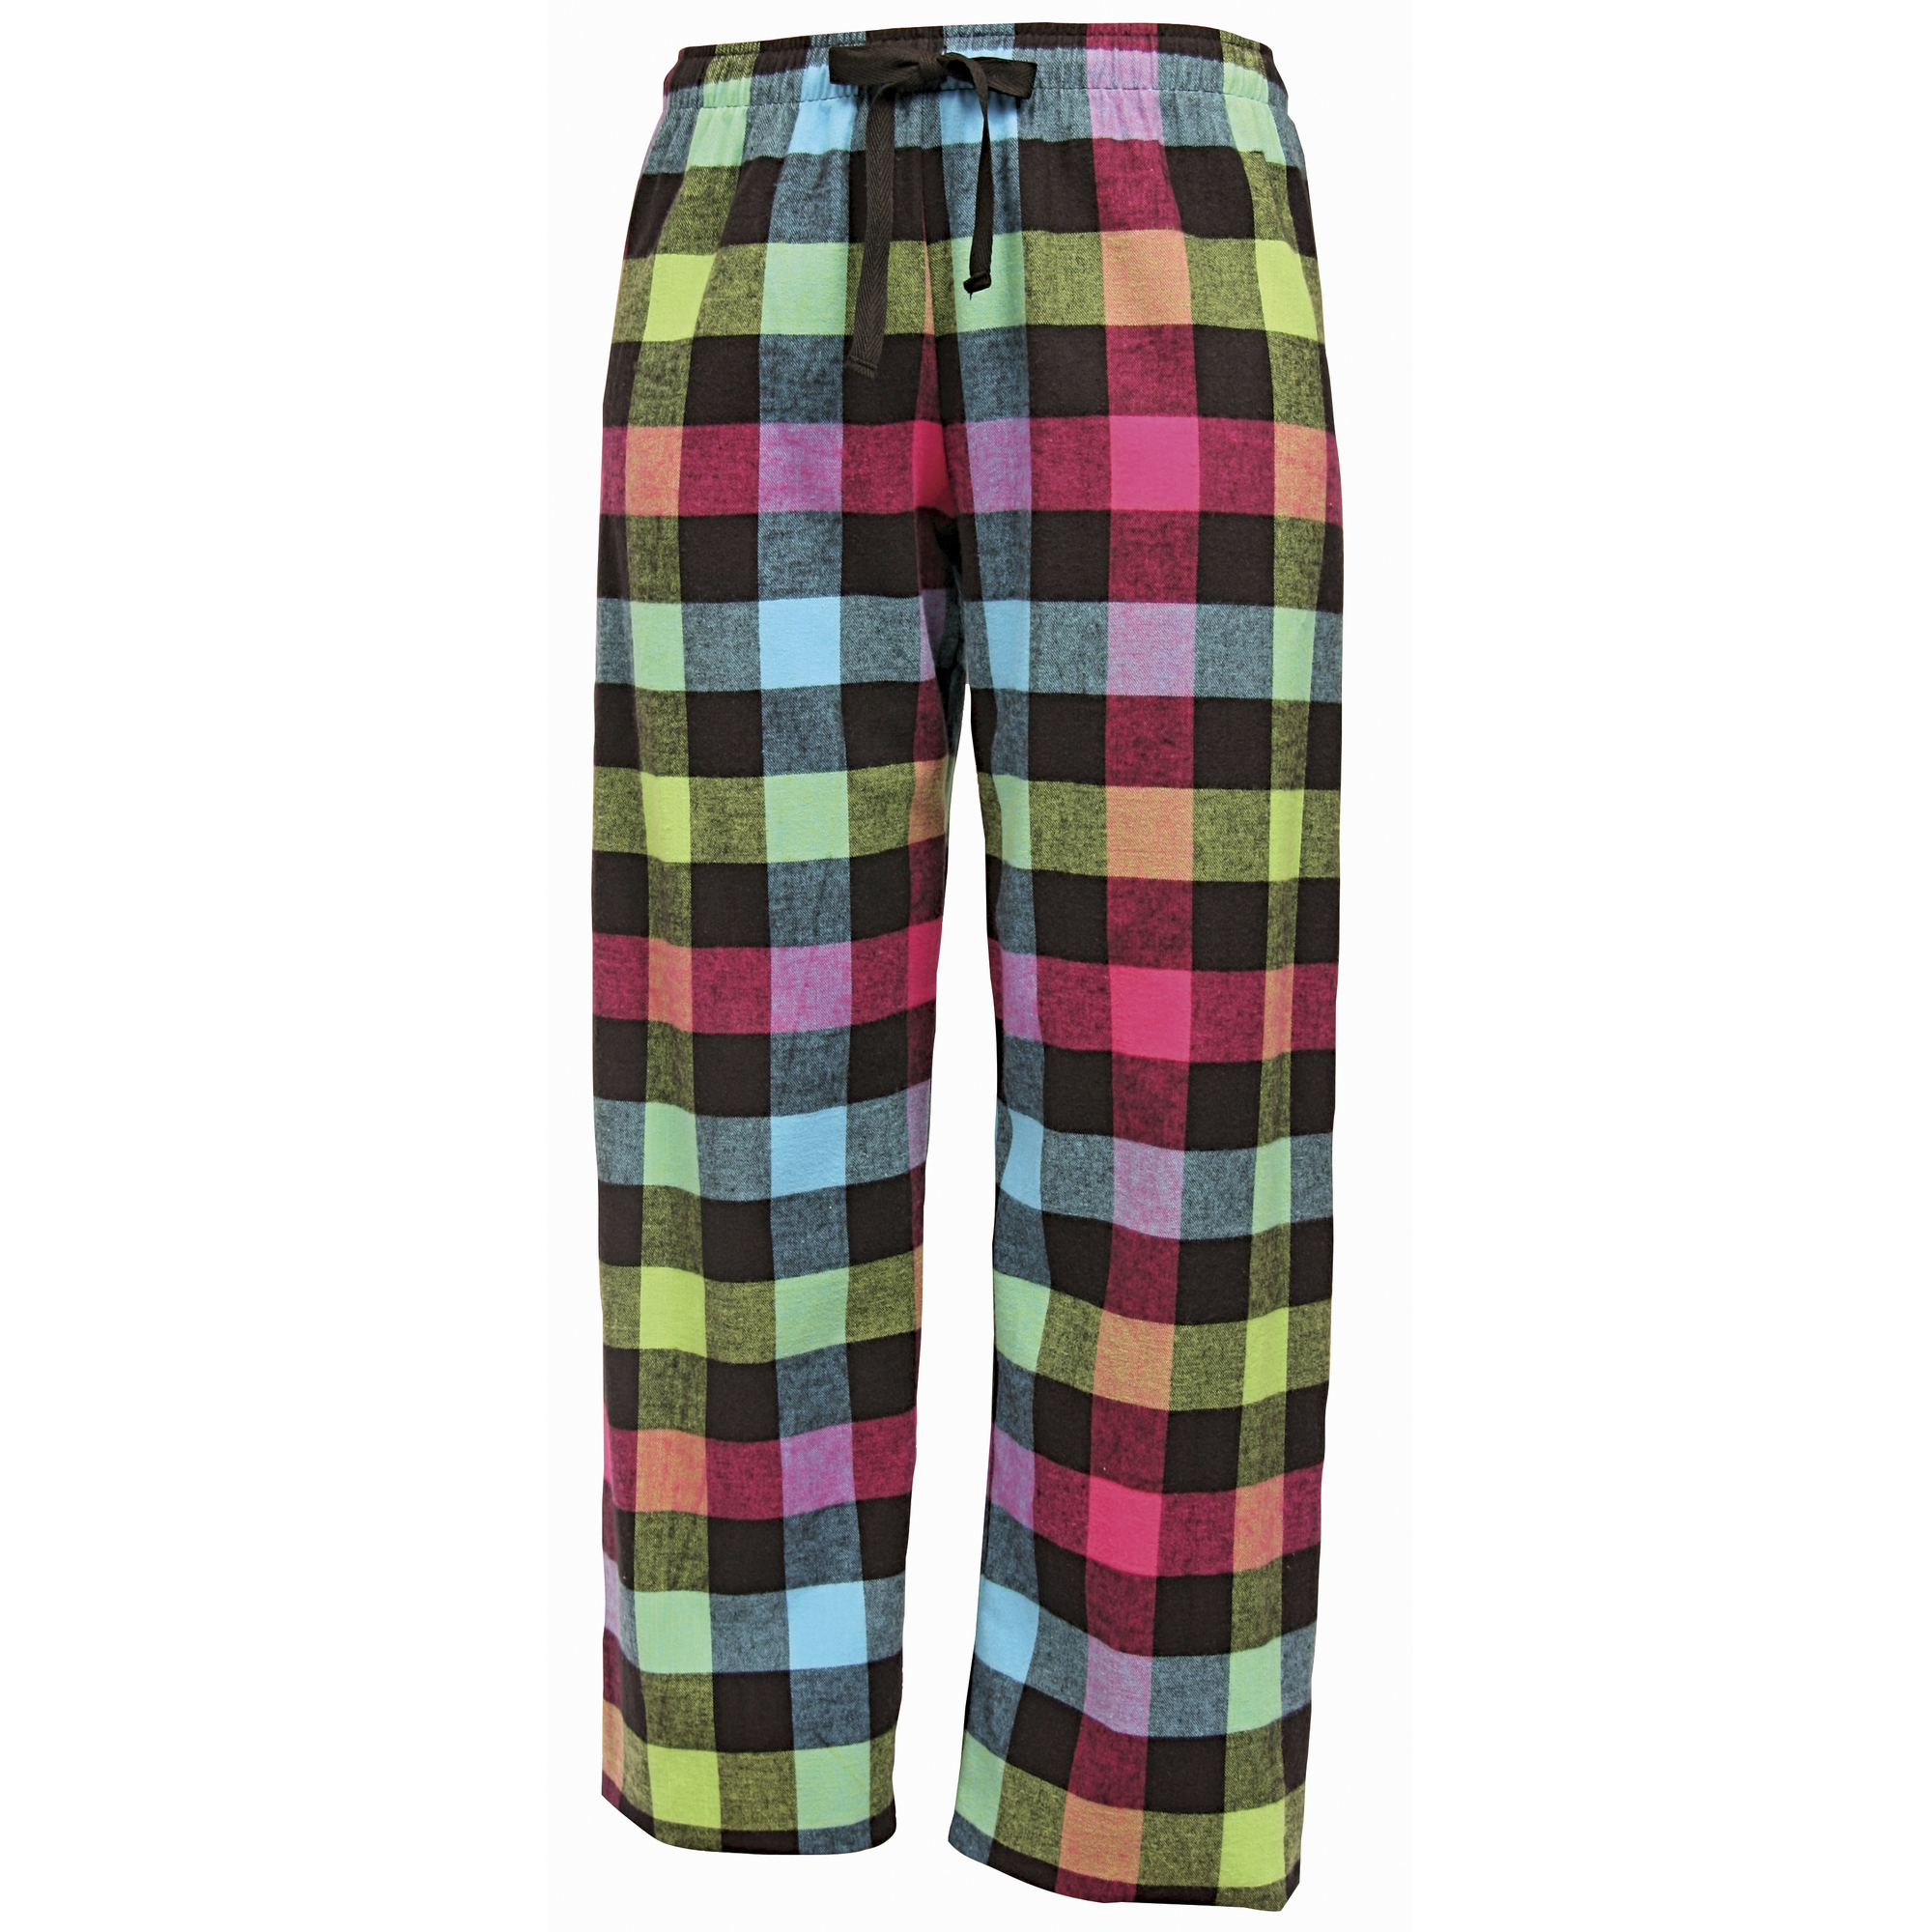 boxercraft herren winter flanell pyjama hose schlafanzughose ebay. Black Bedroom Furniture Sets. Home Design Ideas